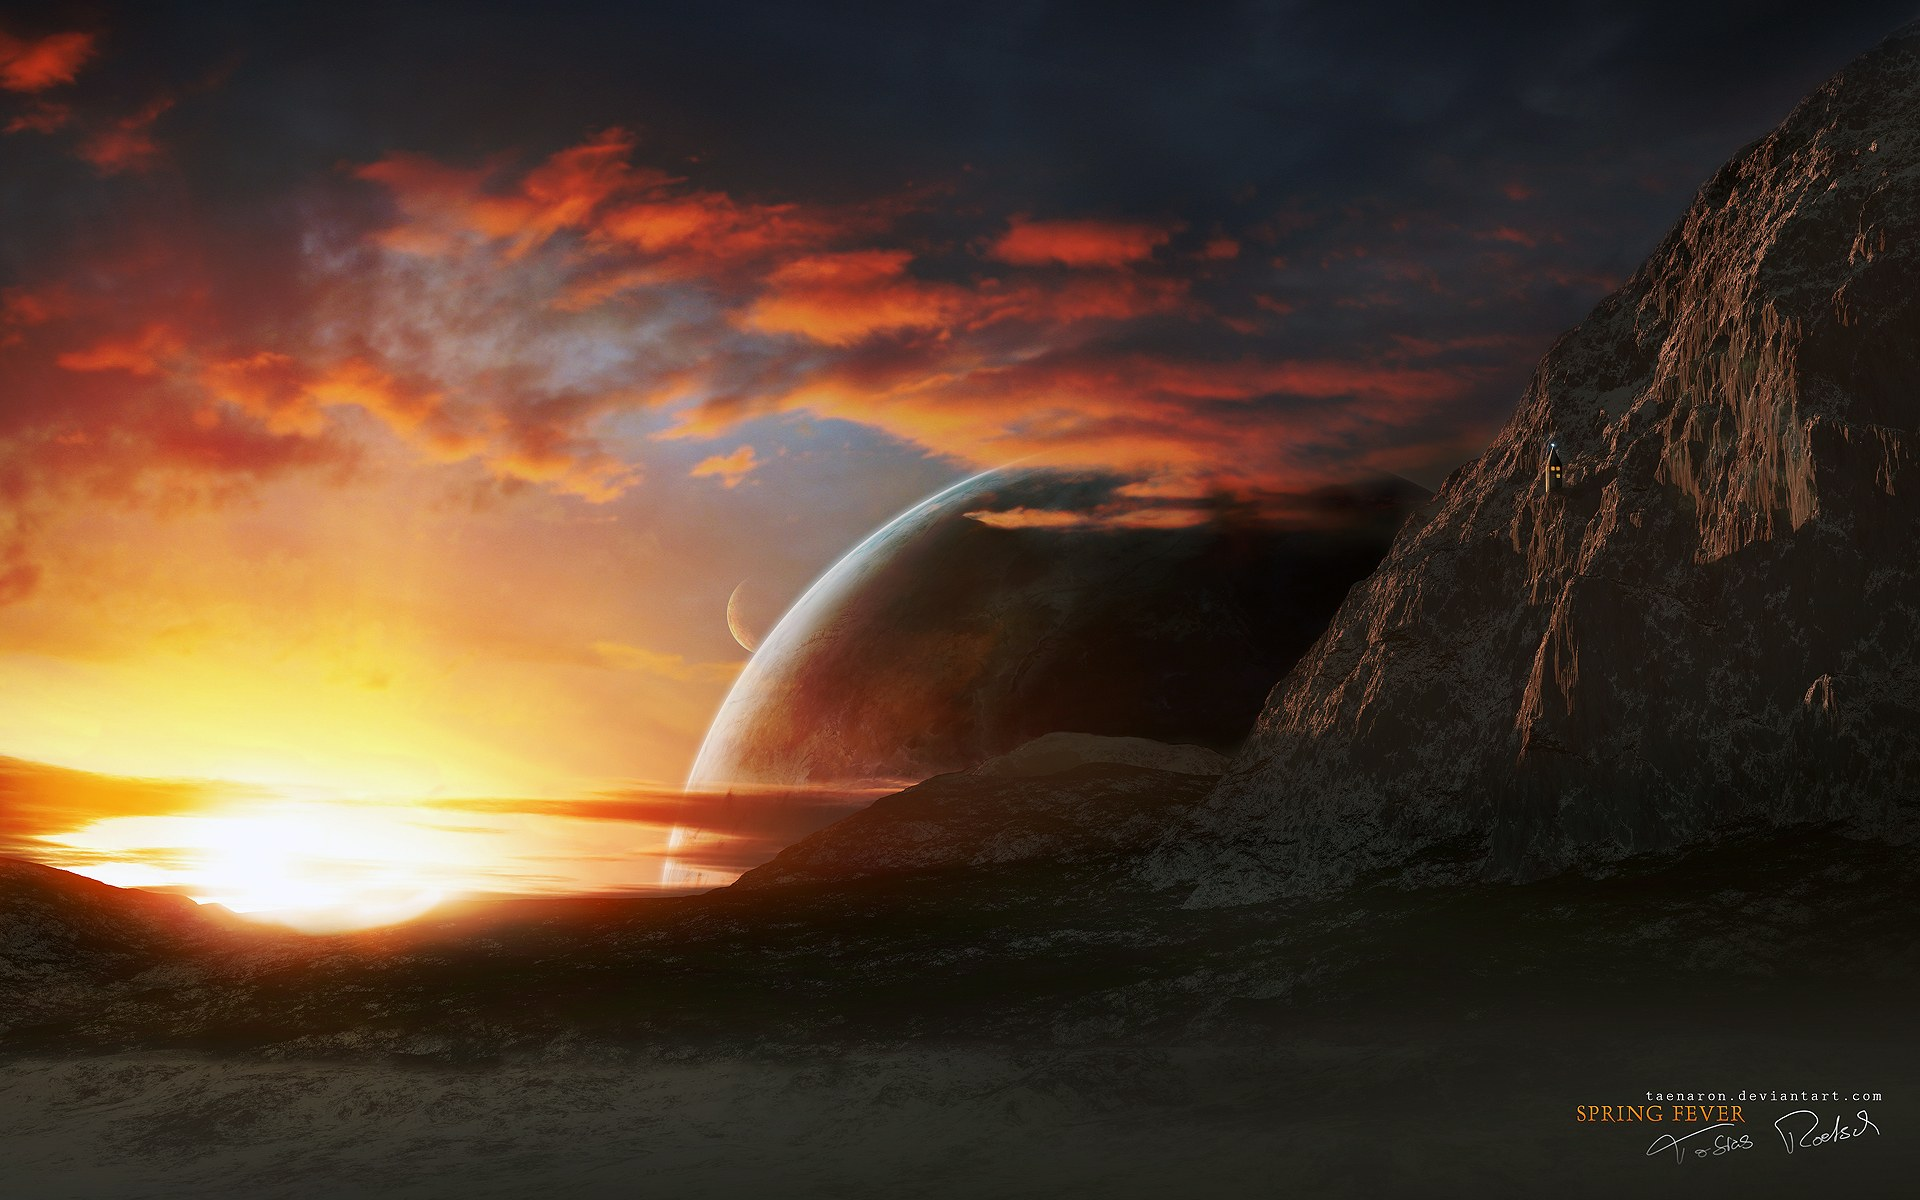 Hd Digital Art Of Universe And Planets 16801050 No18 Wallpaper HD 1920x1200